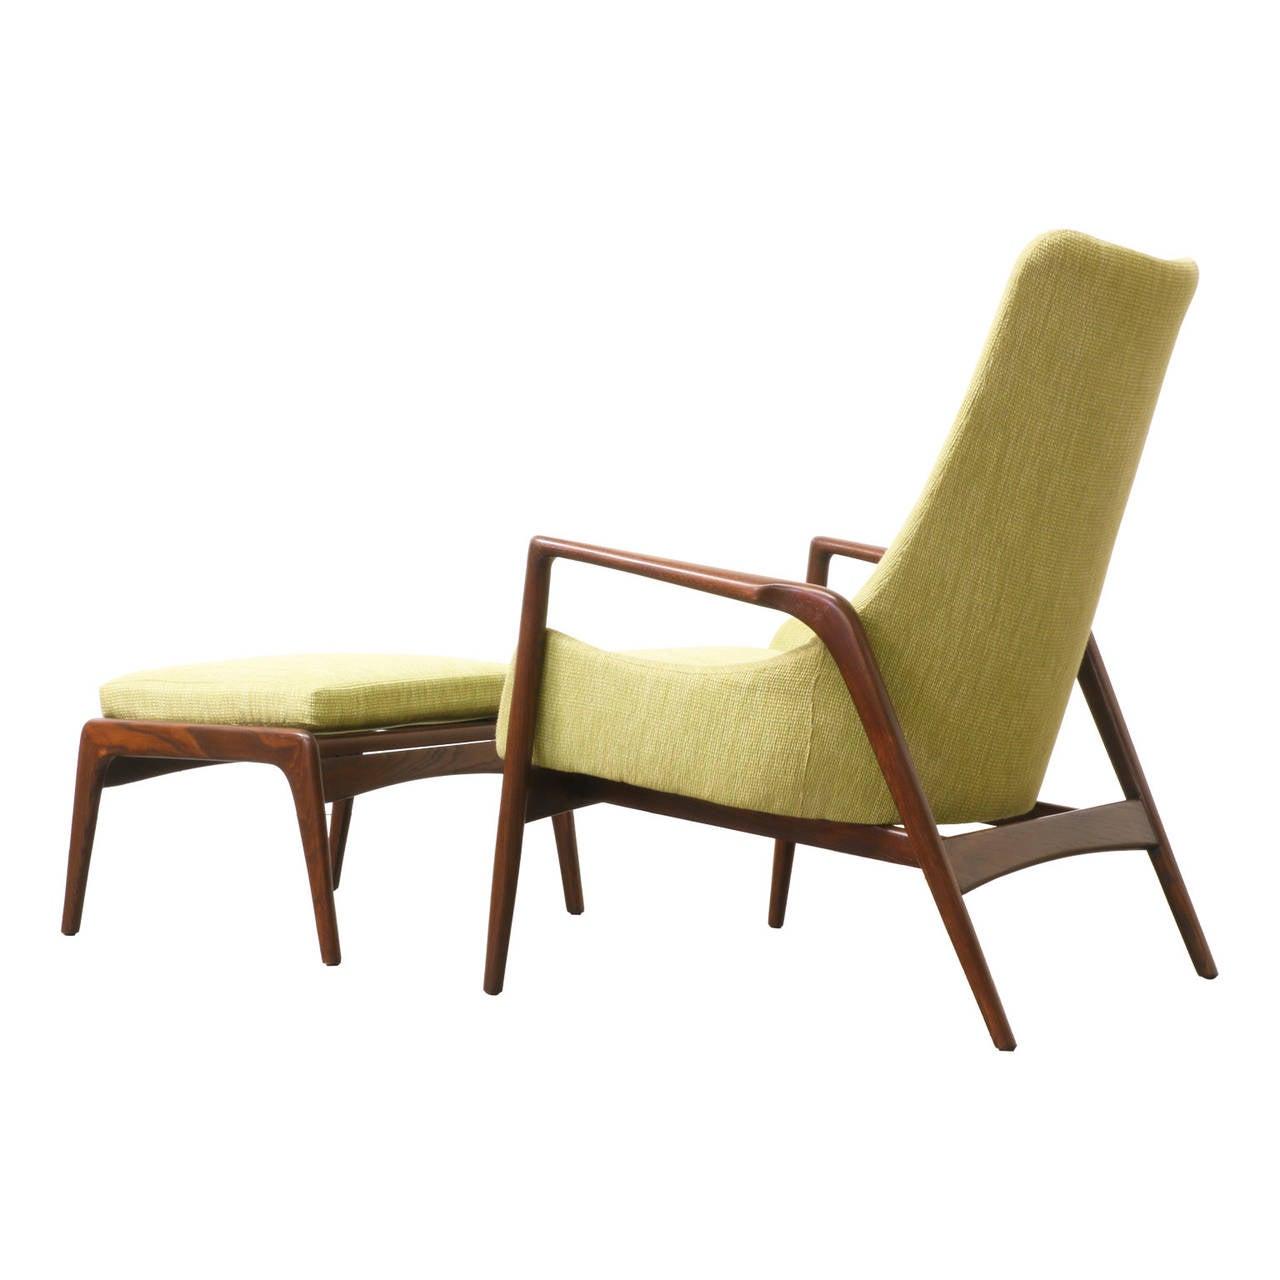 Kofod Larsen Lounge Chair with Ottoman at 1stdibs